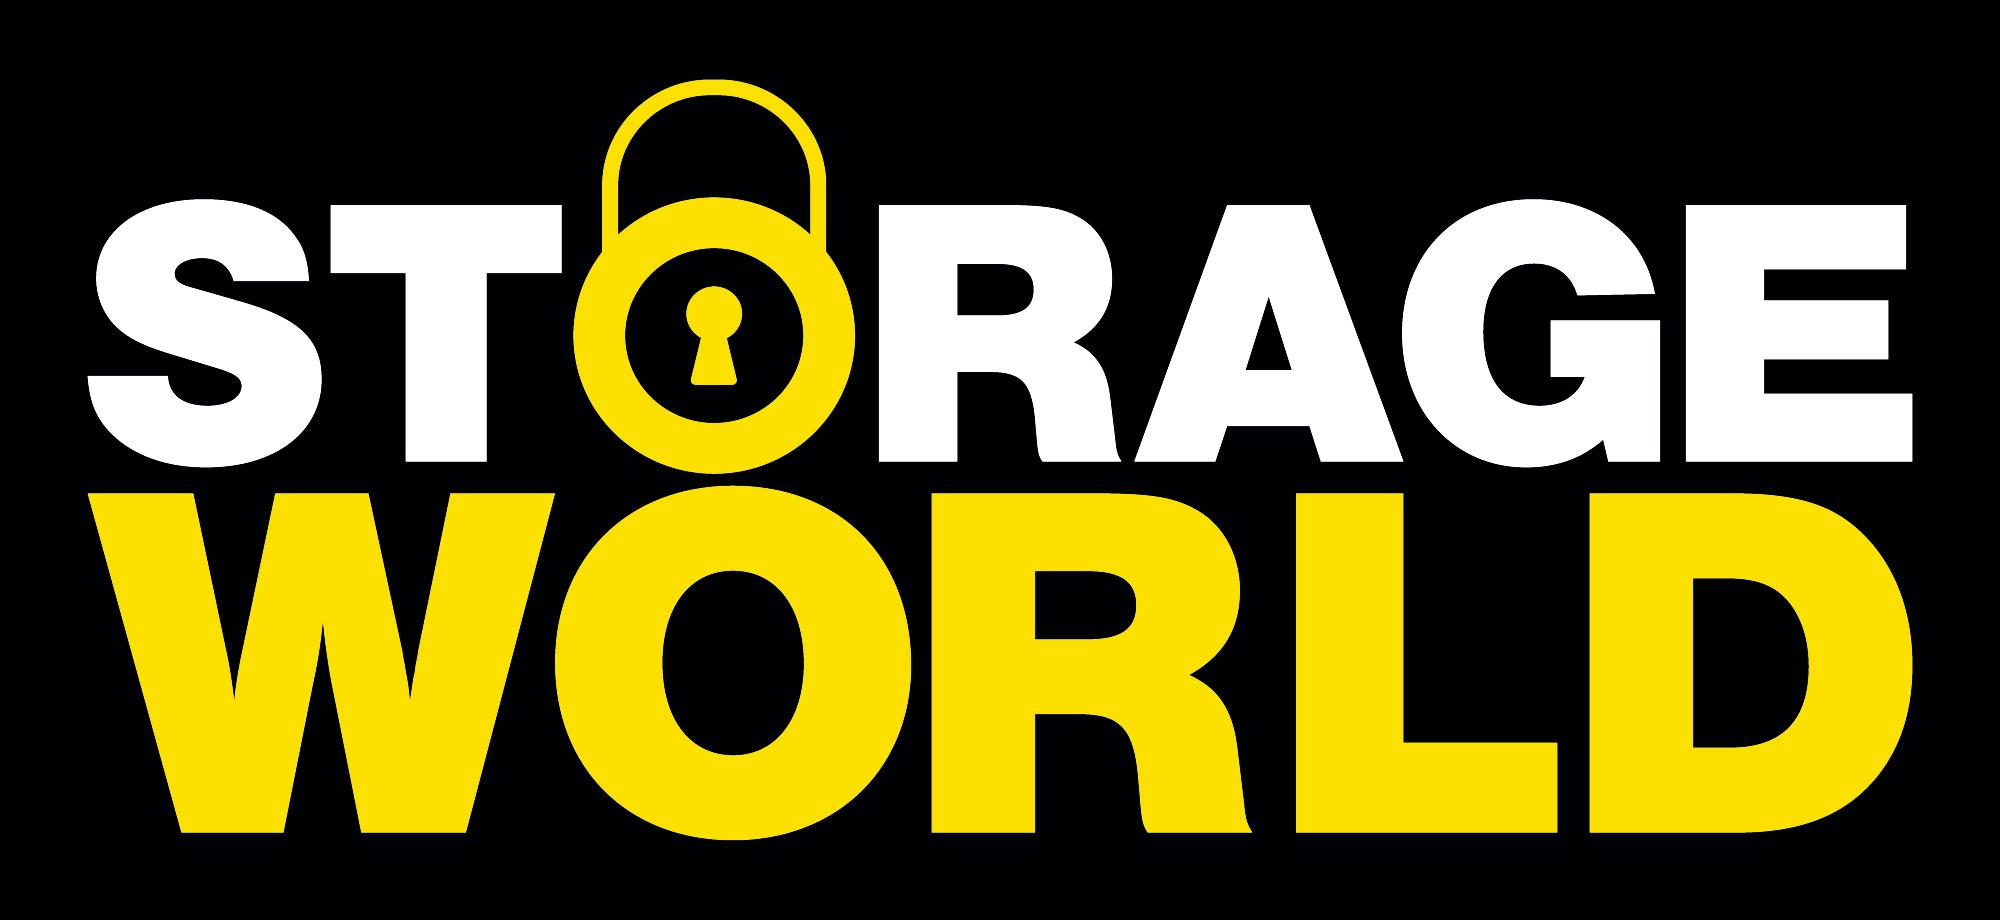 Read Storage World Self Storage & Workspace Reviews